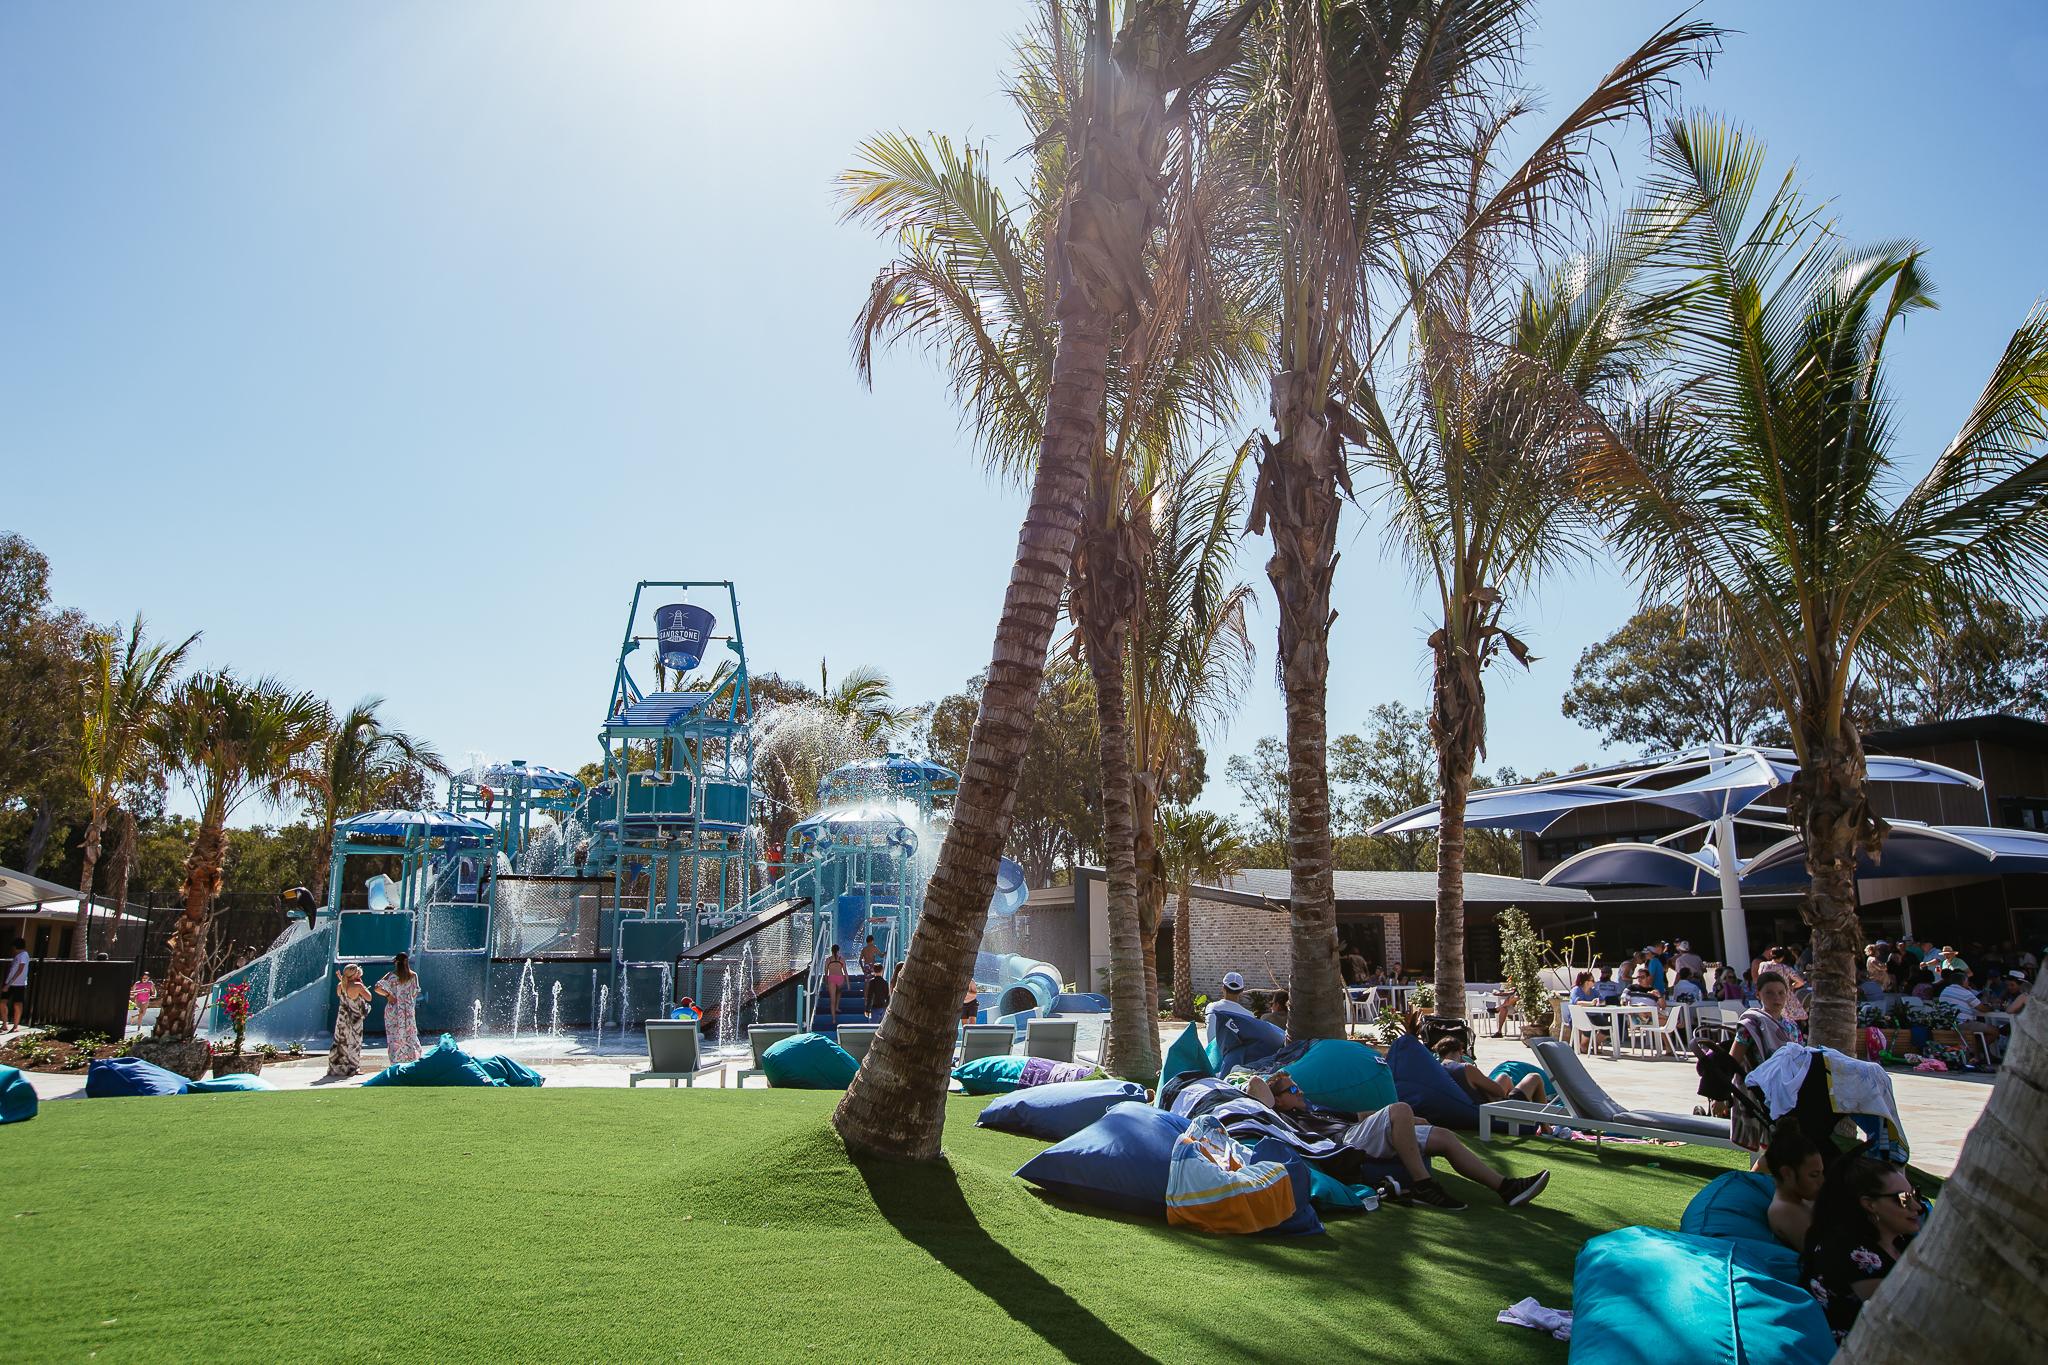 BIG4 Sandstone Point Holiday Park